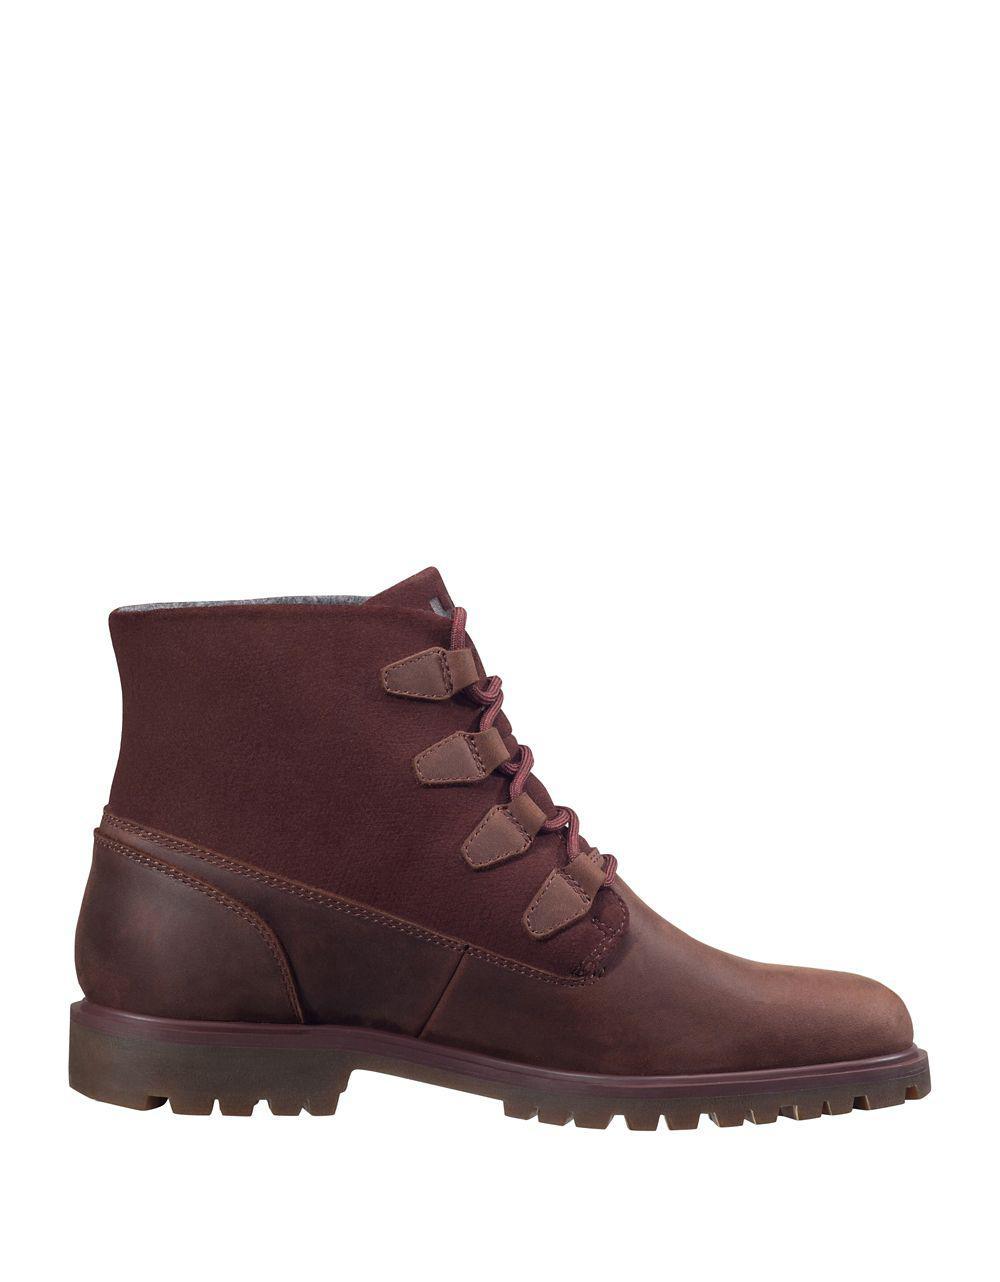 Helly Hansen Cordova Winter Boot(Women's) -Brunette/Red Brown/Sperry Gum Outlet Store Sale Online lvibJIbwc